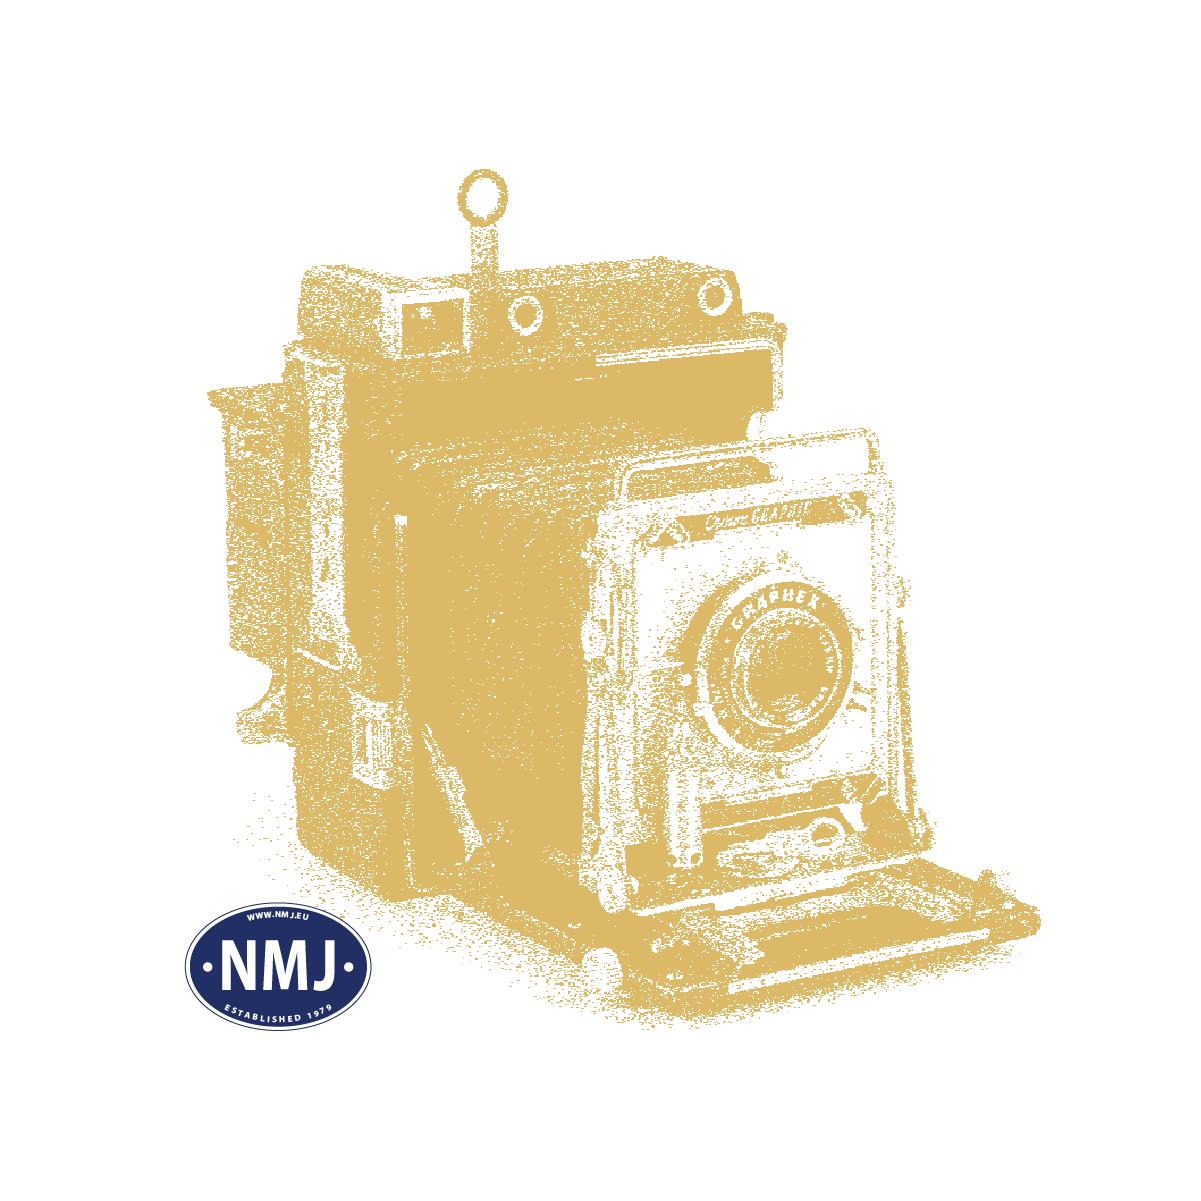 Superline Lokomotiver, nmj-superline-nsb-30b-357-nmjs30b357-dcc-sound-h0, NMJS30b357